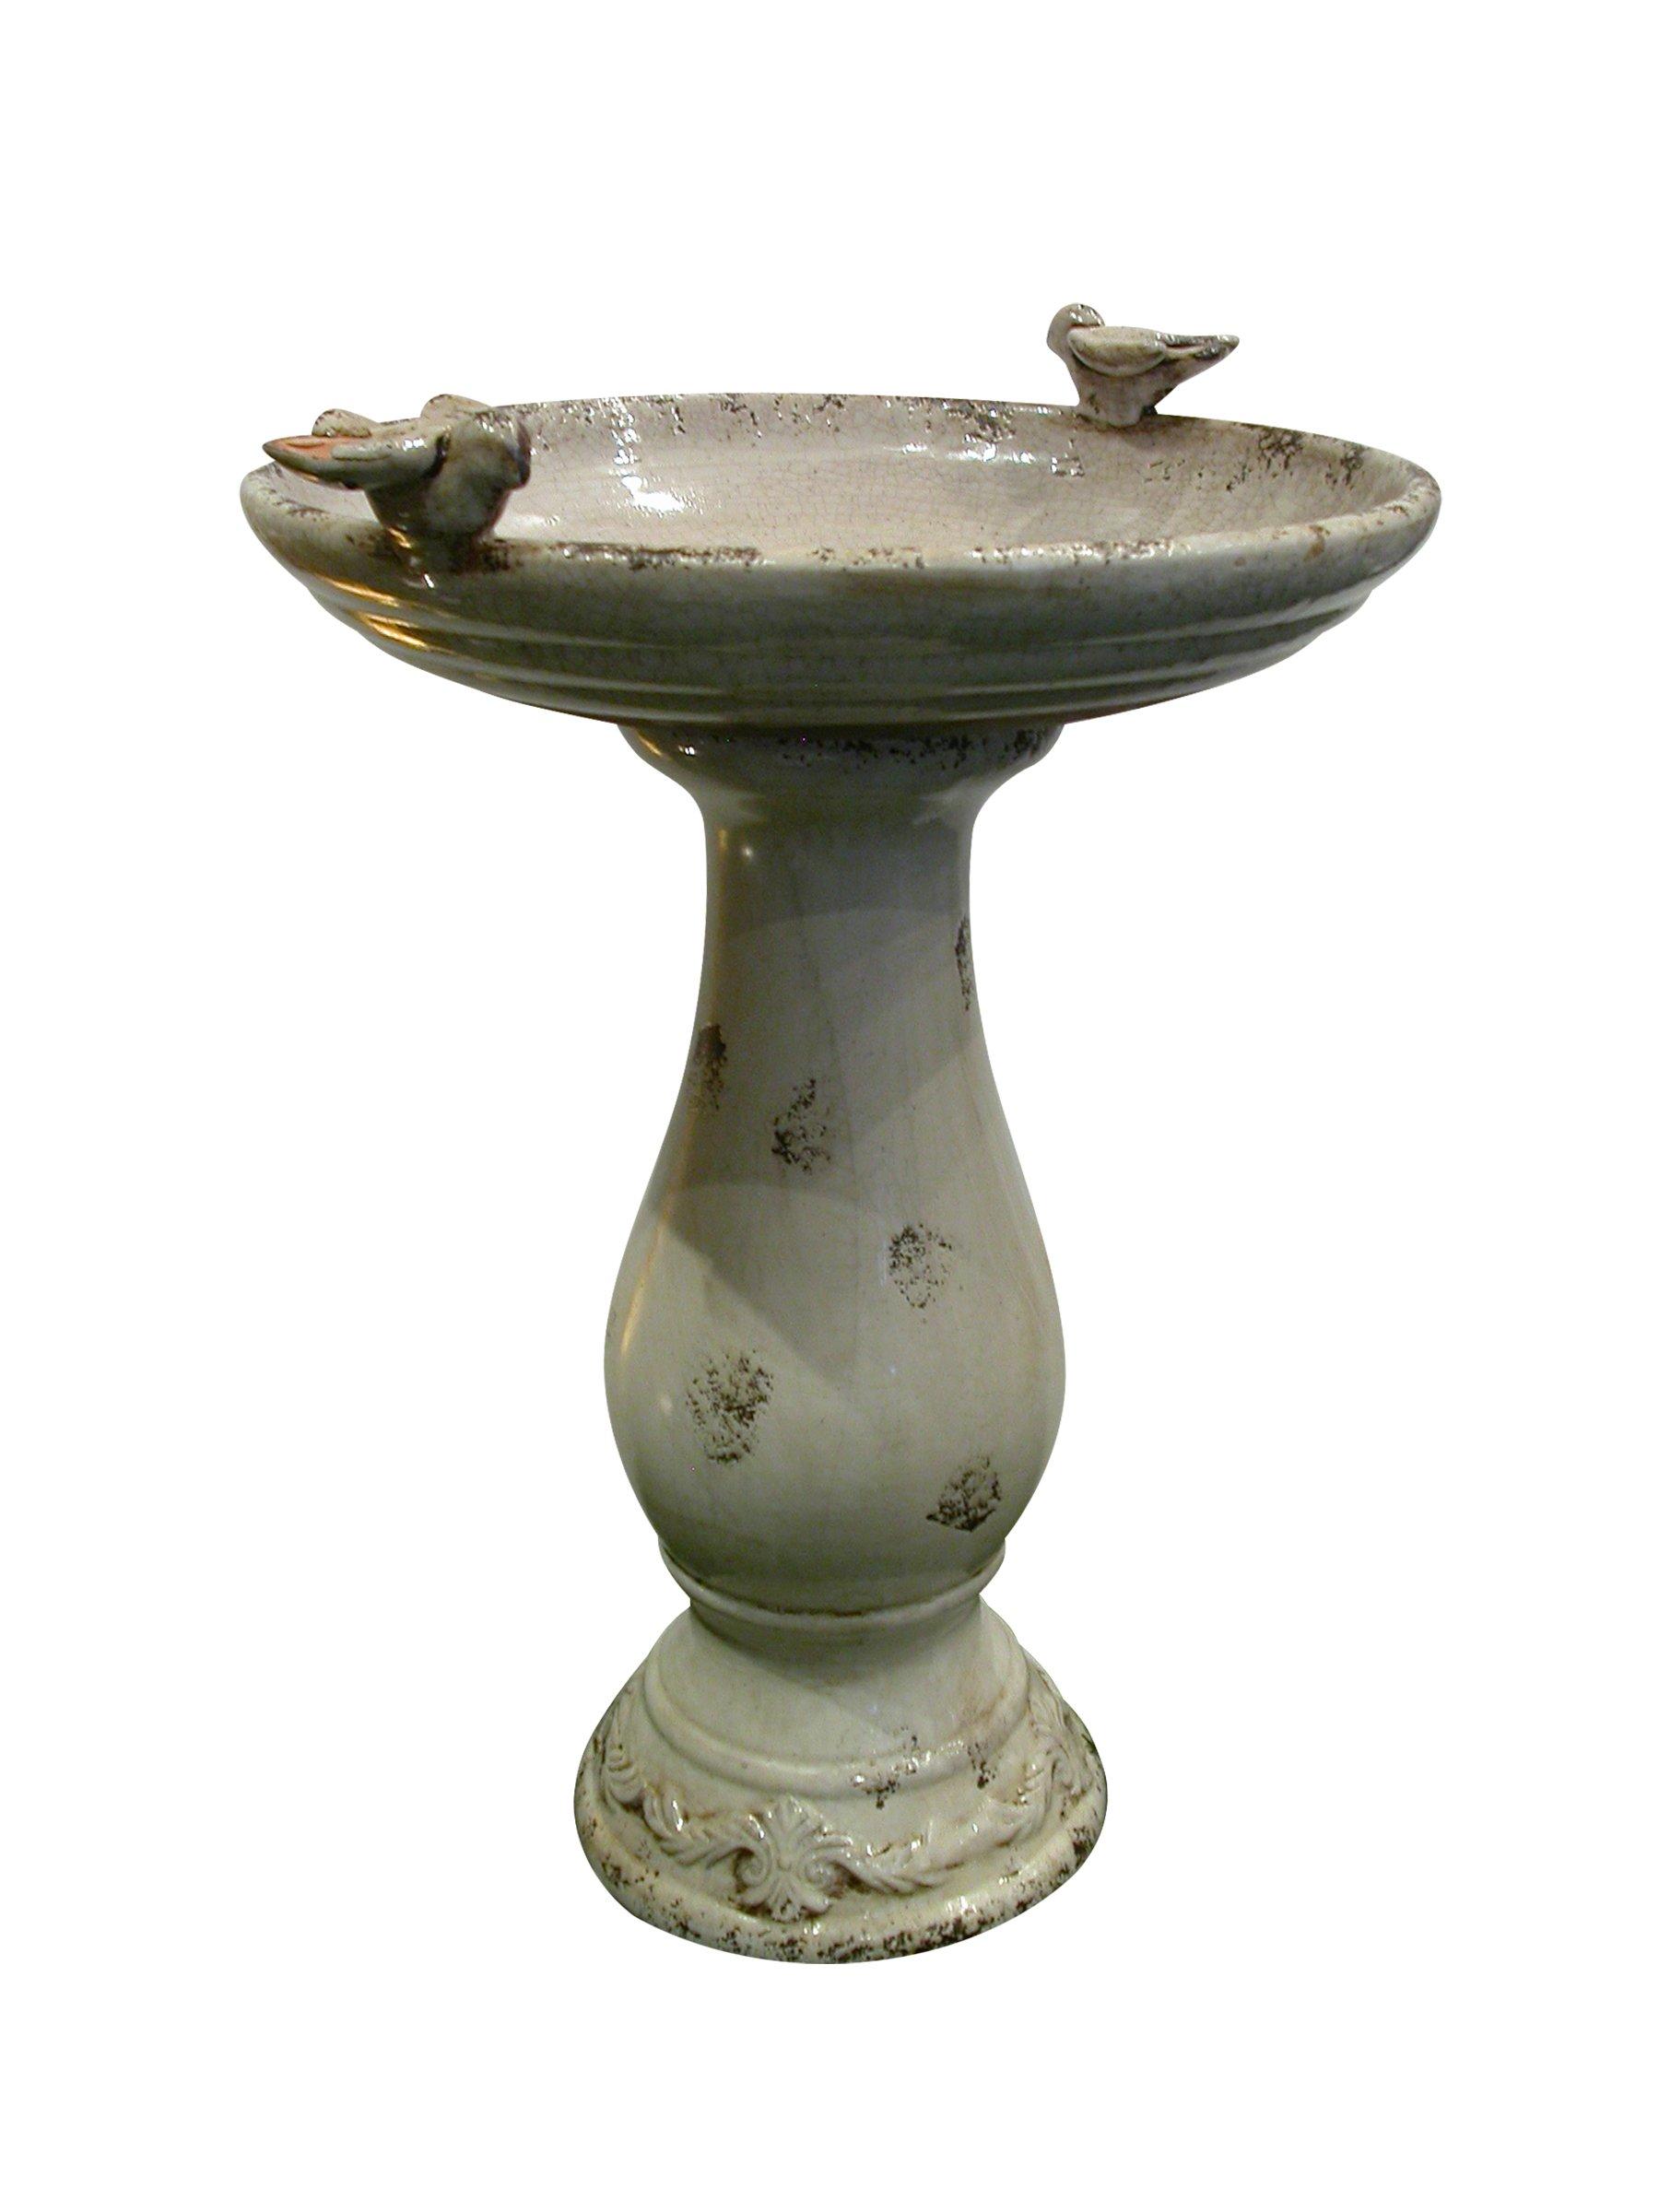 Benzara Antique Ceramic Bird Bath with 2 Birds, Light Brown